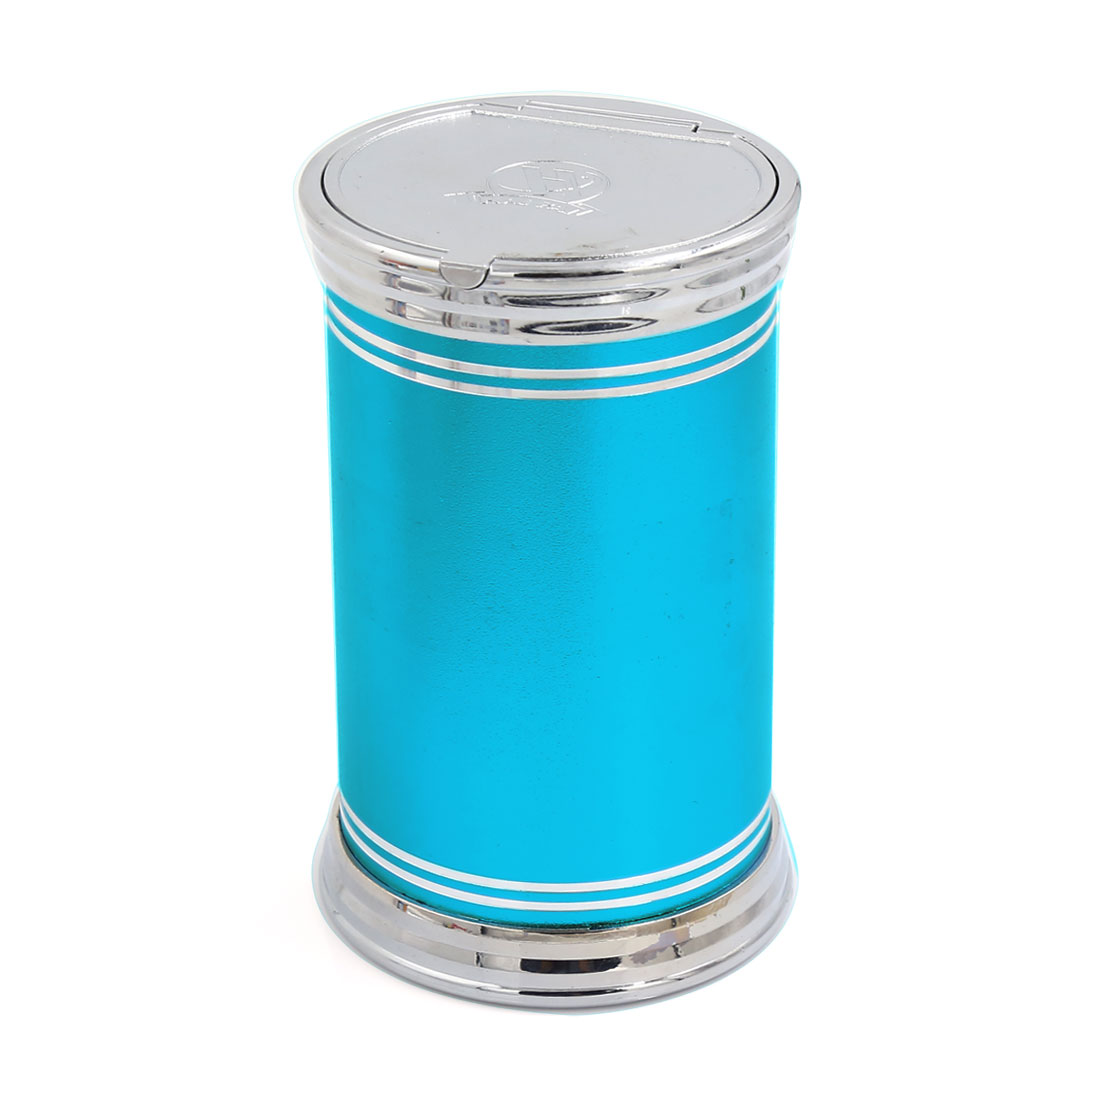 Portable Blue LED Light Car Auto Ashtray Cigarette Ash Holder Cup 11.5cm x 7cm